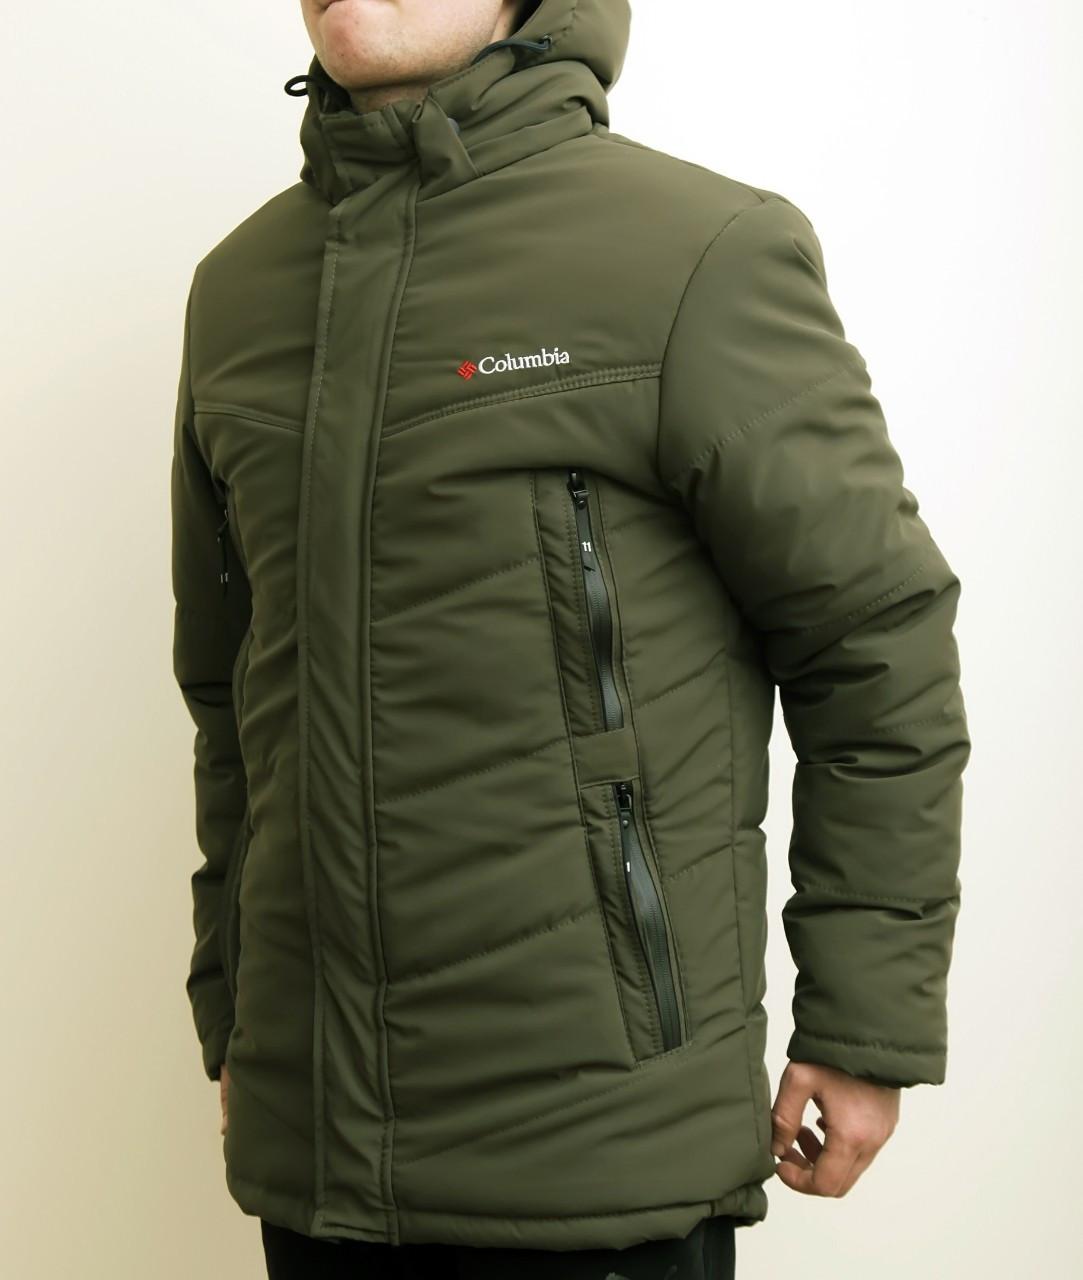 Мужская зимняя куртка парка Columbia 9081 темно зелений - Интернет-магазин